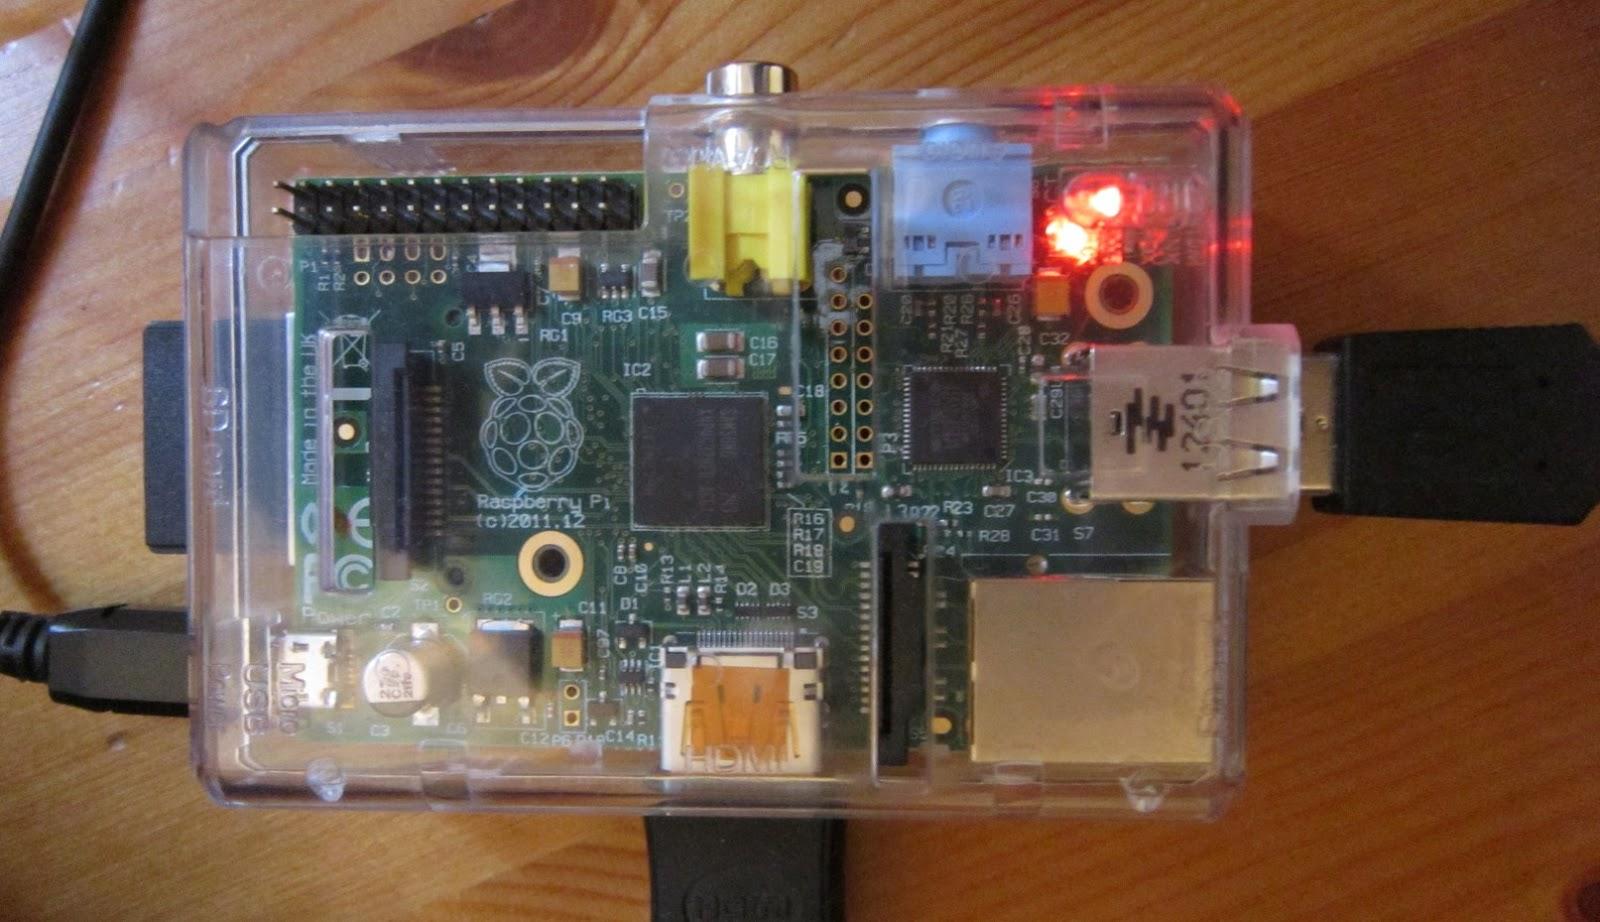 A powered on Raspberry Pi.